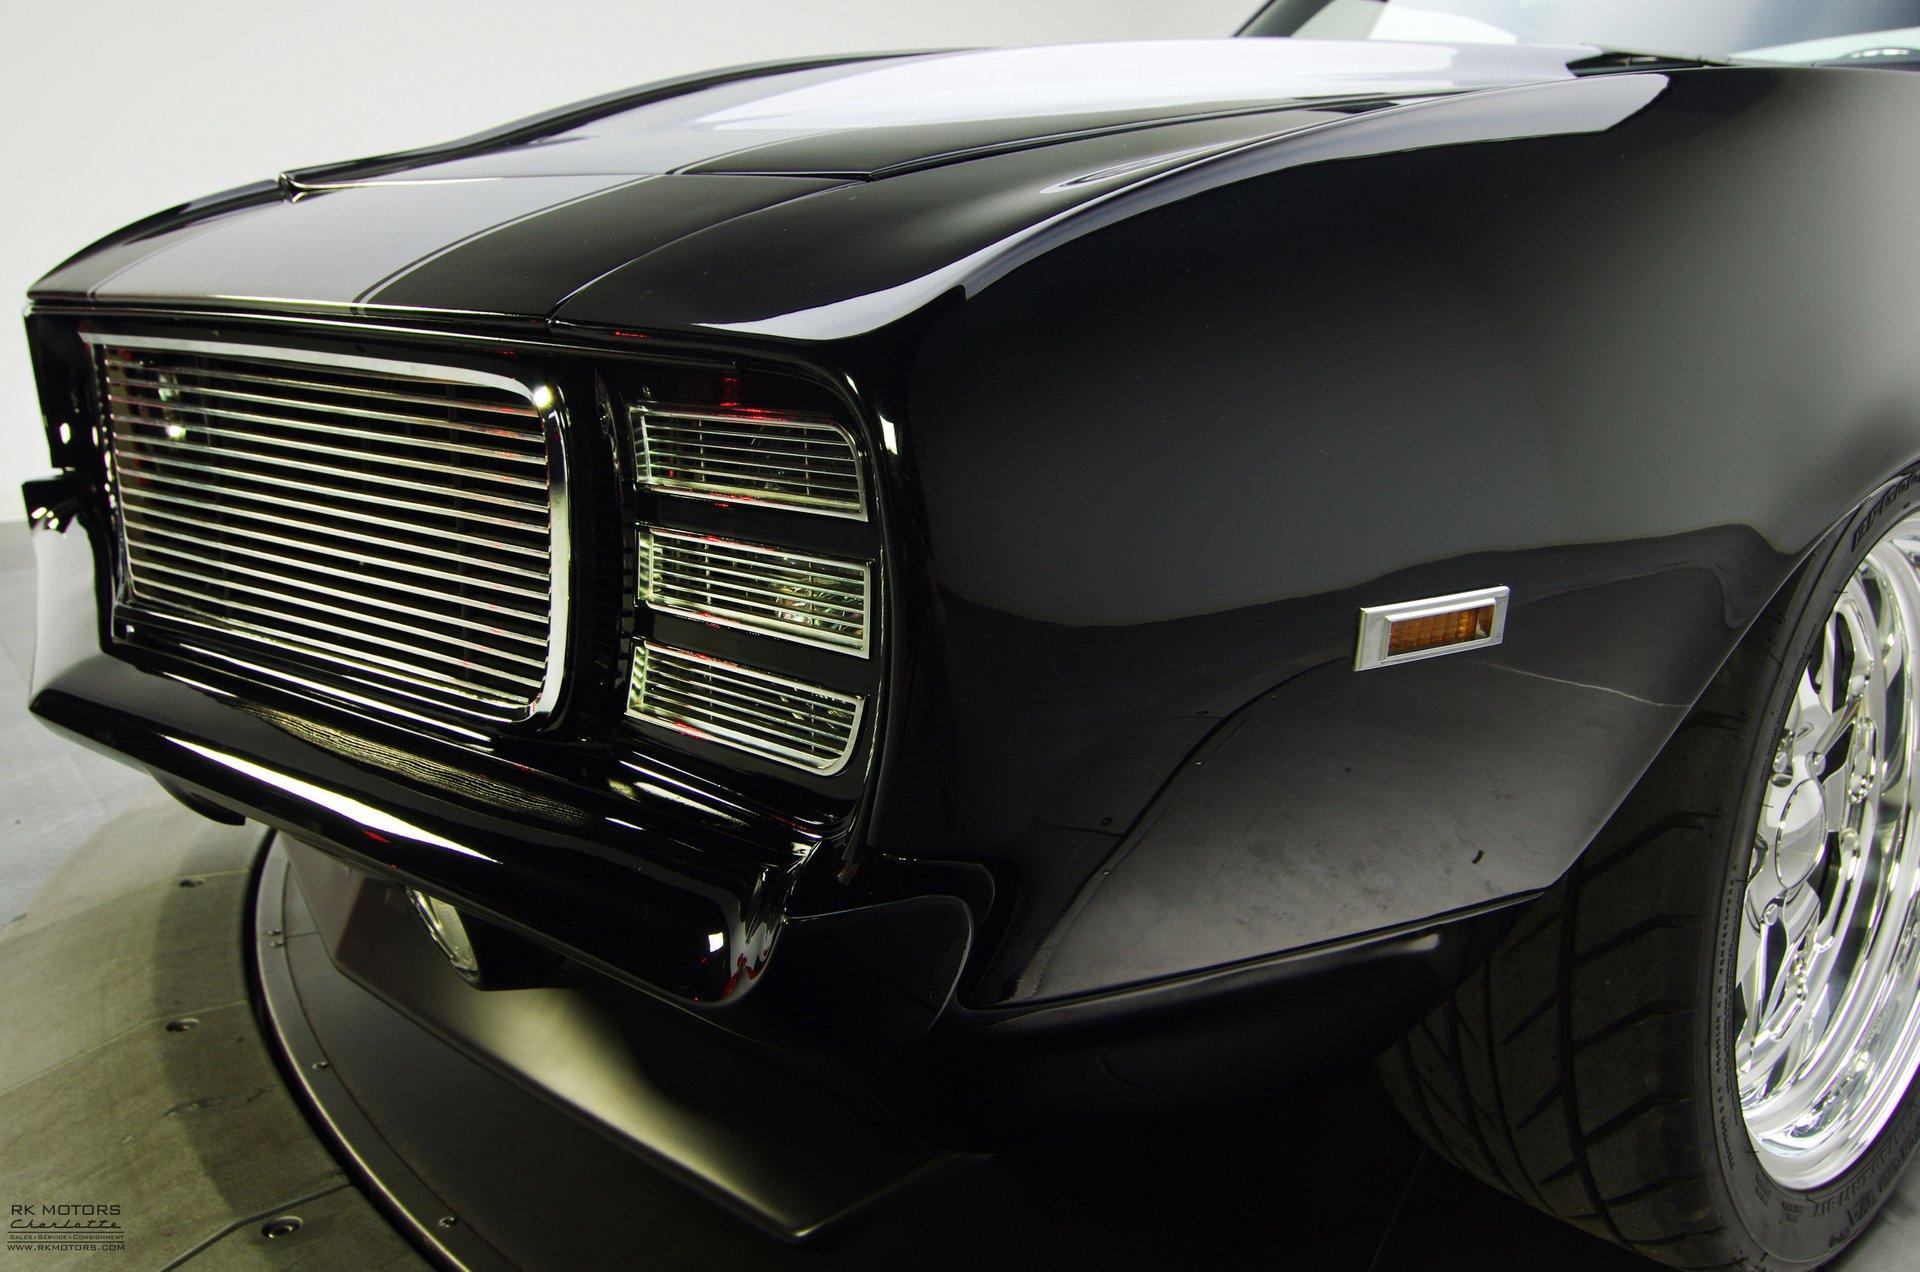 132817 1969 Chevrolet Camaro RK Motors Classic Cars for Sale